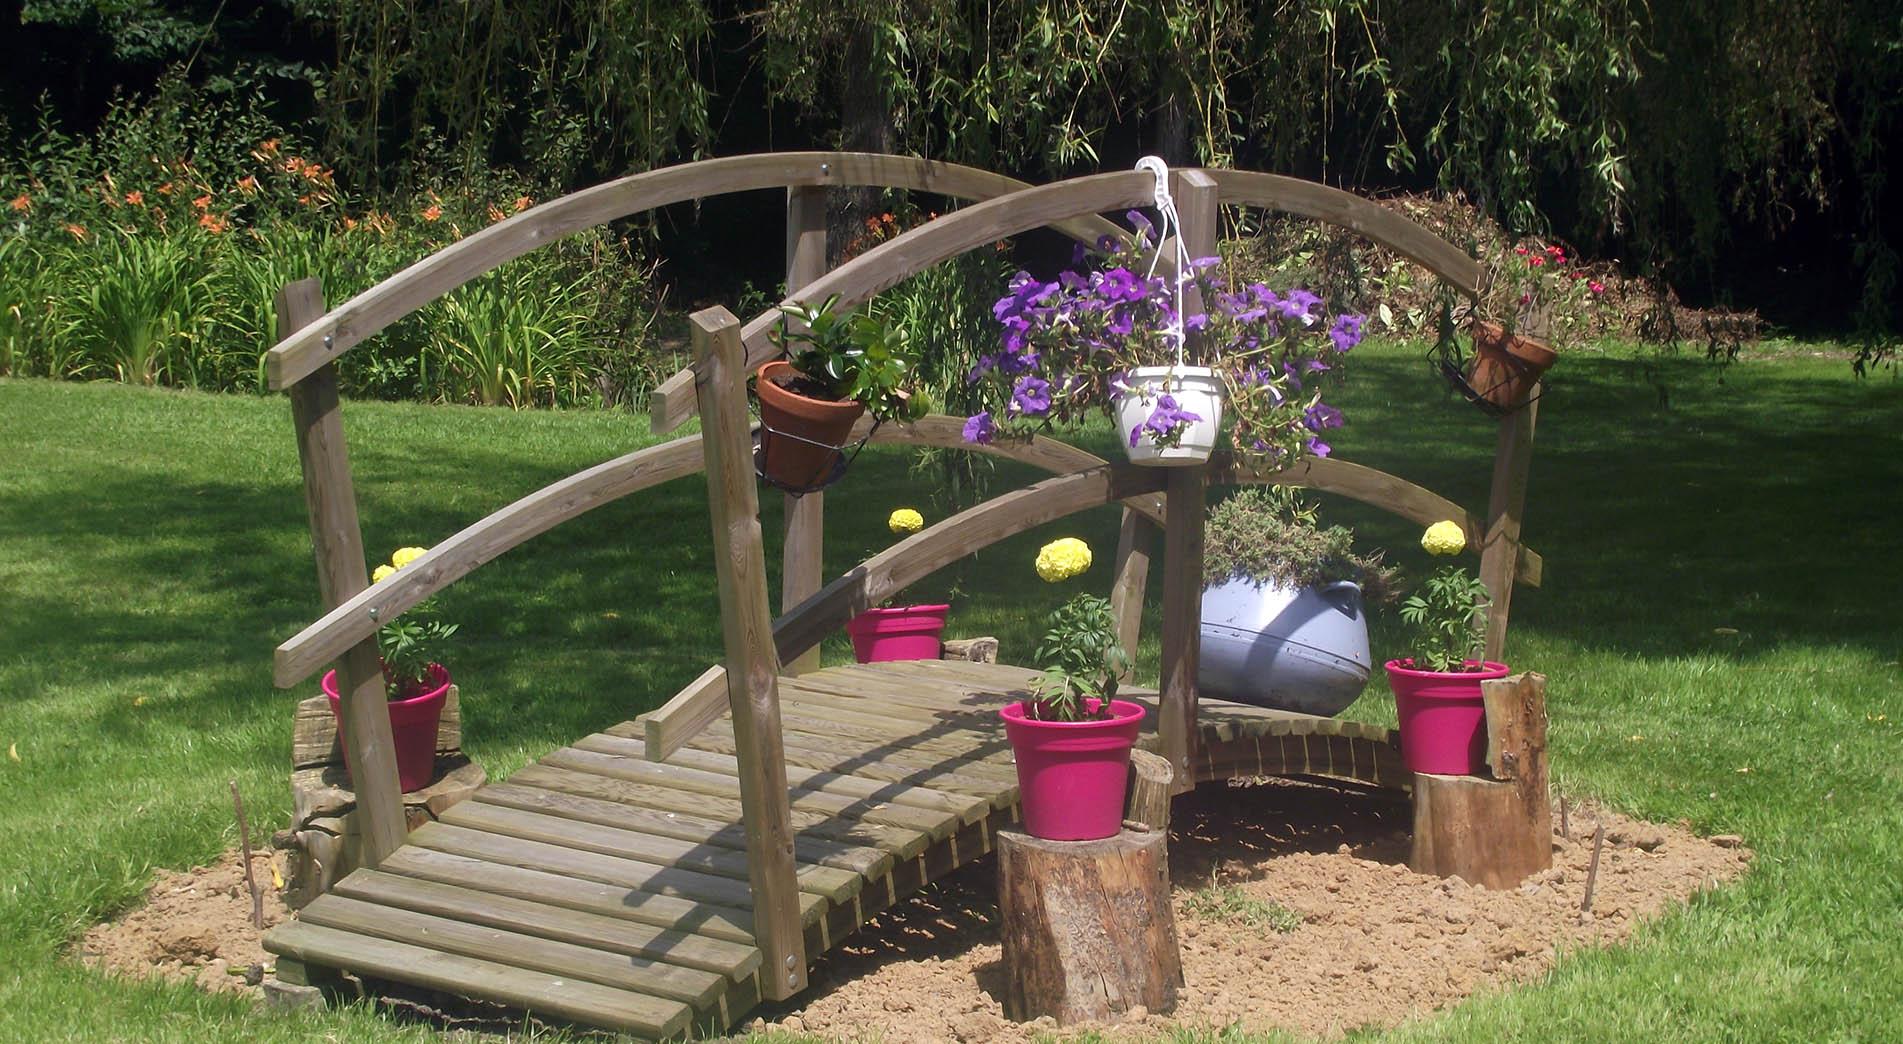 abri de jardin mobilier de jardin 27 flbc. Black Bedroom Furniture Sets. Home Design Ideas